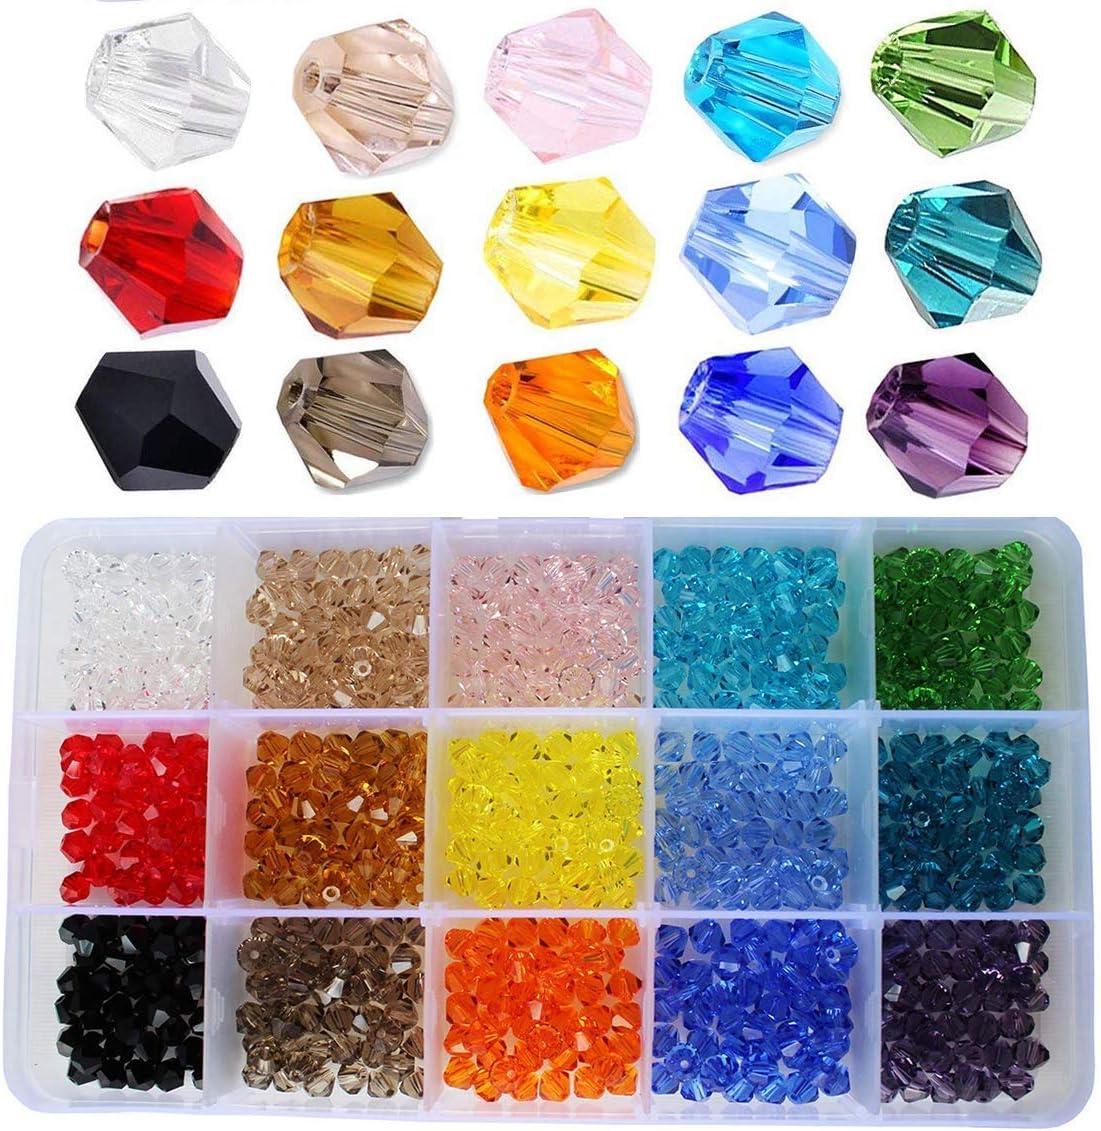 9mm x 6mm Topaz AB 15 Czech Glass Teardrop Beads